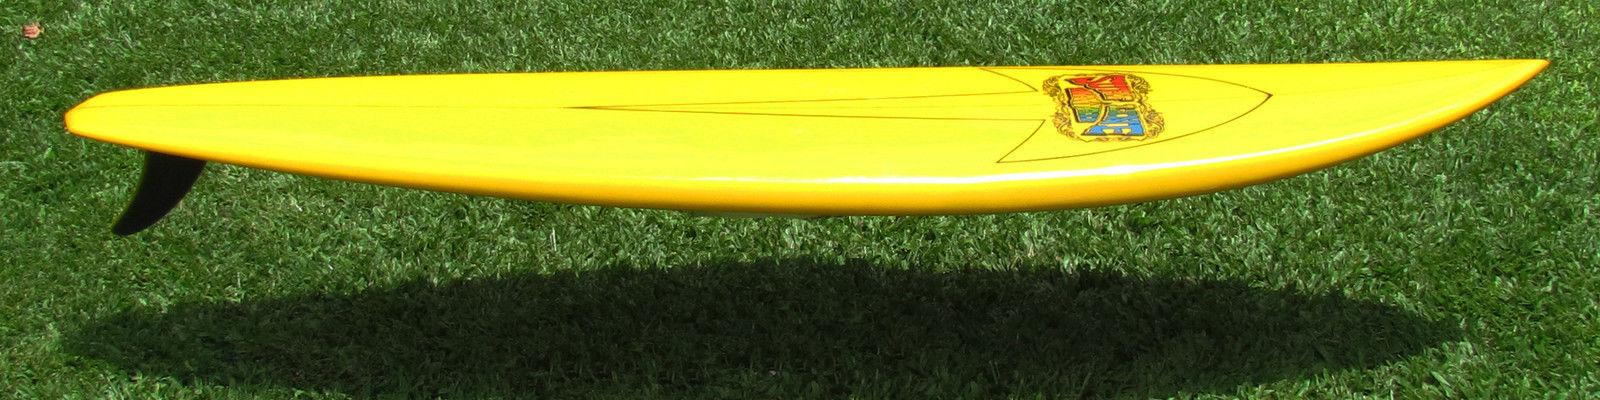 Surf Line Hawaii Ryan Dotson Restored by Randy Rarick1